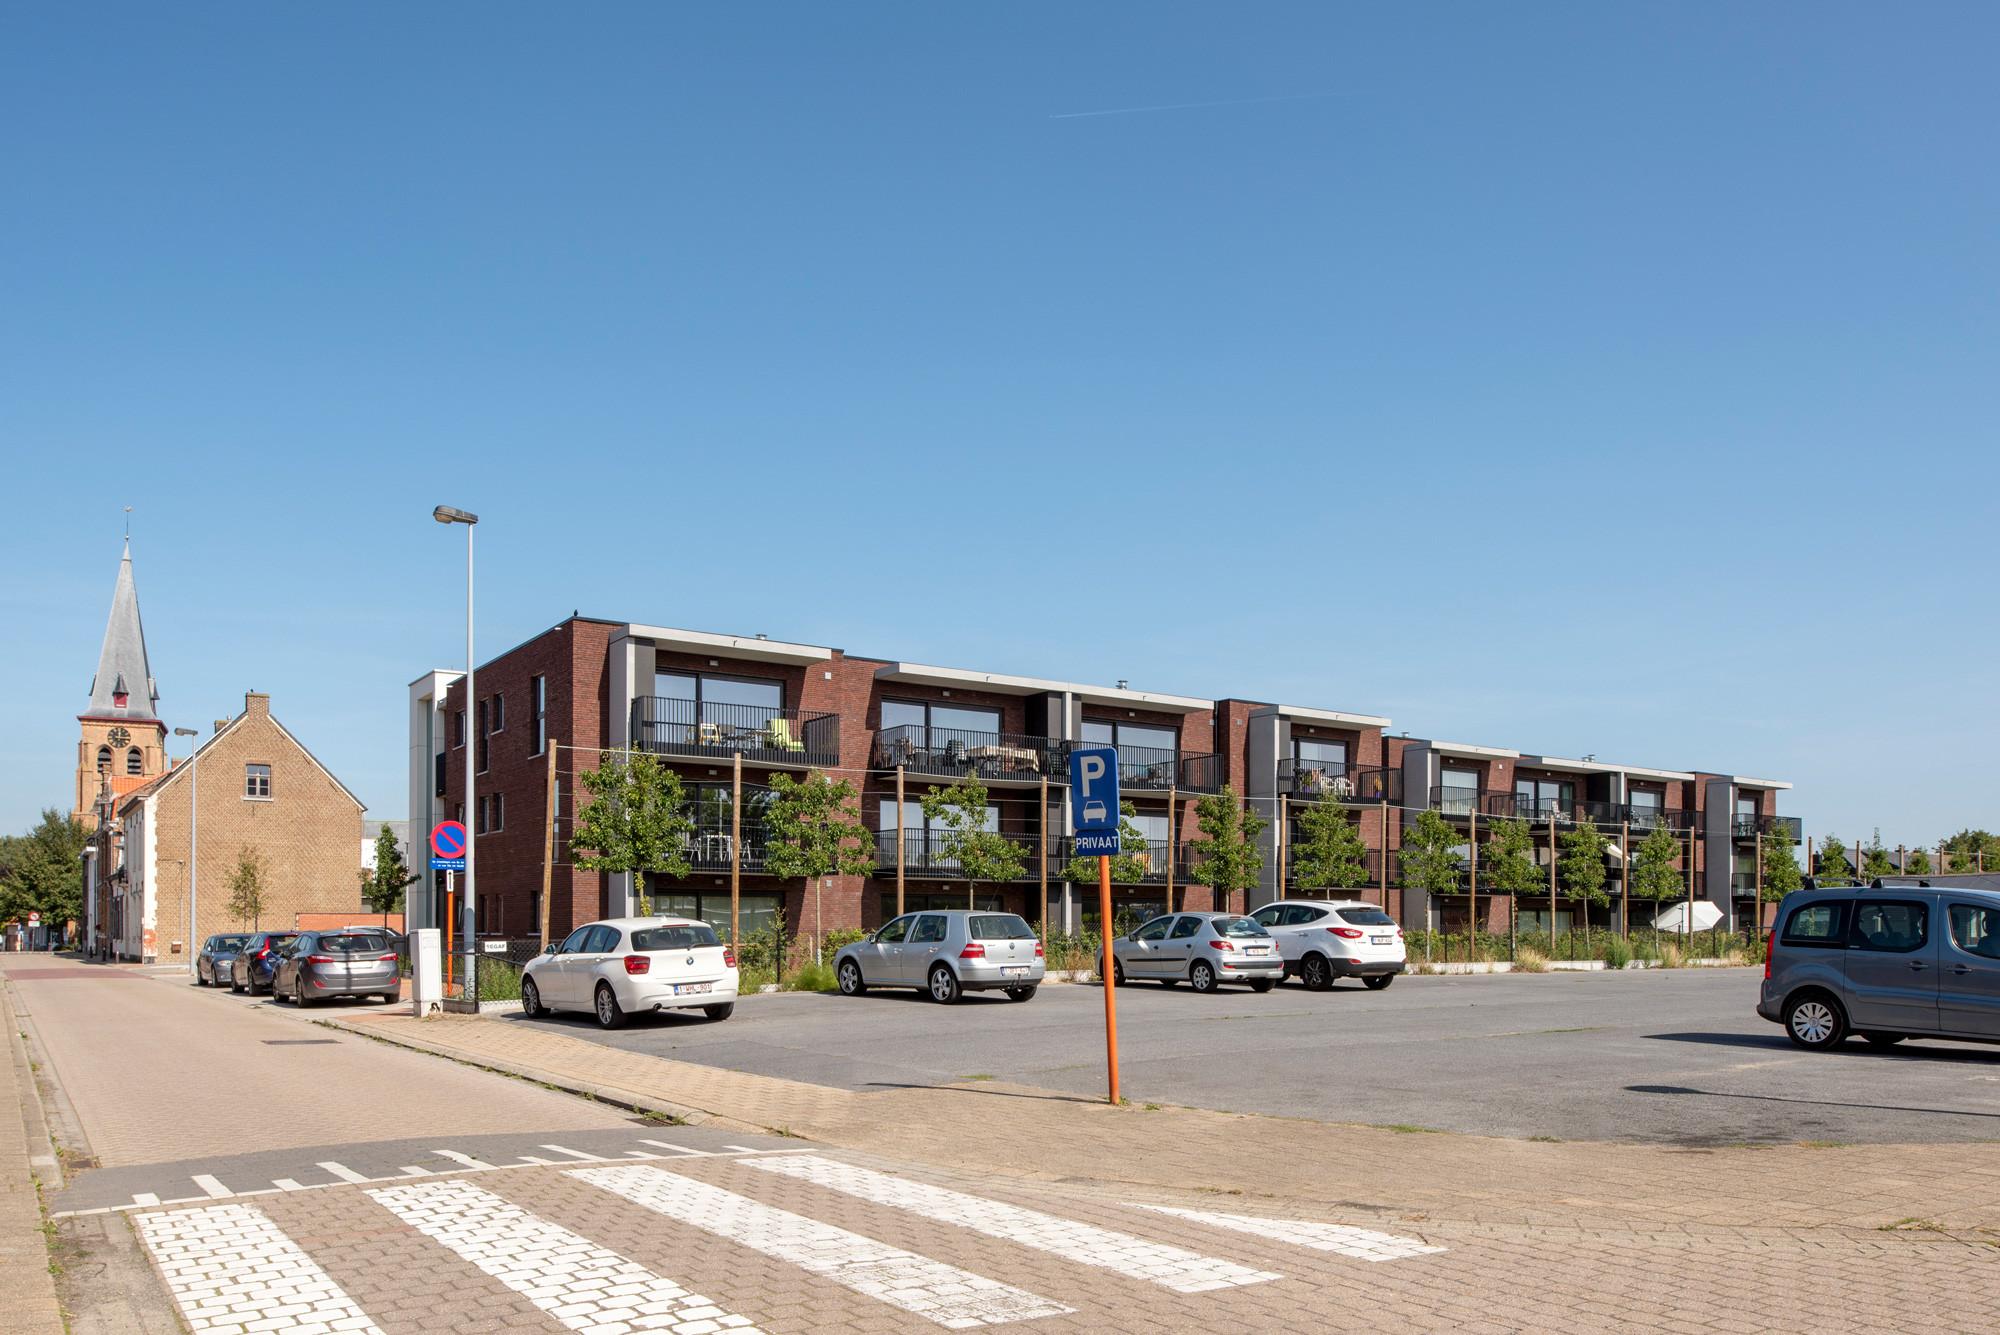 Meergezinswoning_Beernem_Claeys Architecten.jpg